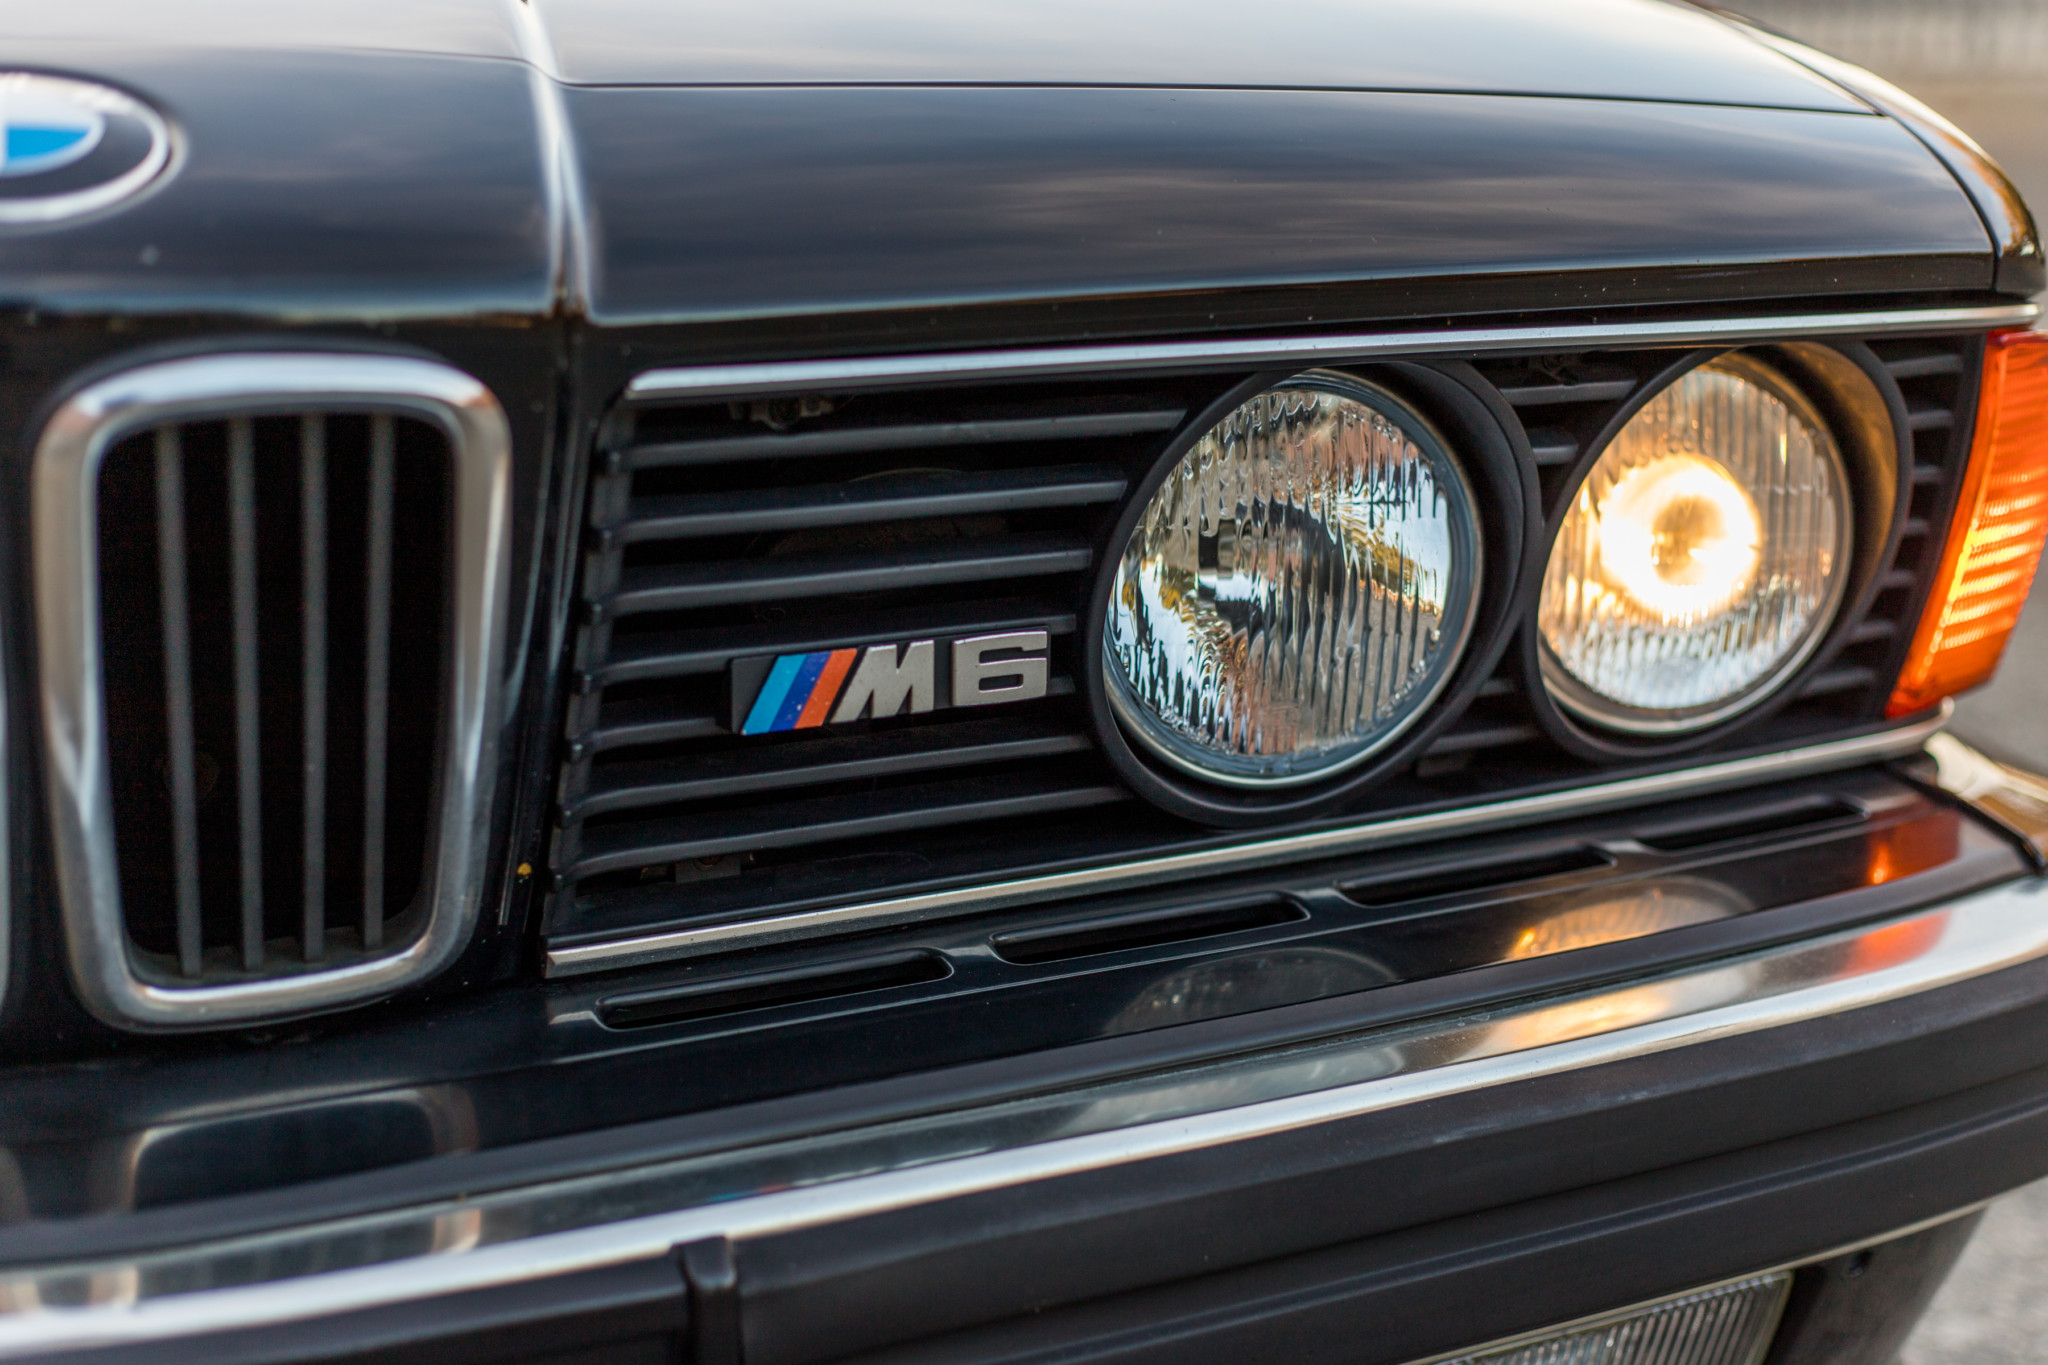 1988 bmw M6 kent classic cars (24).jpg